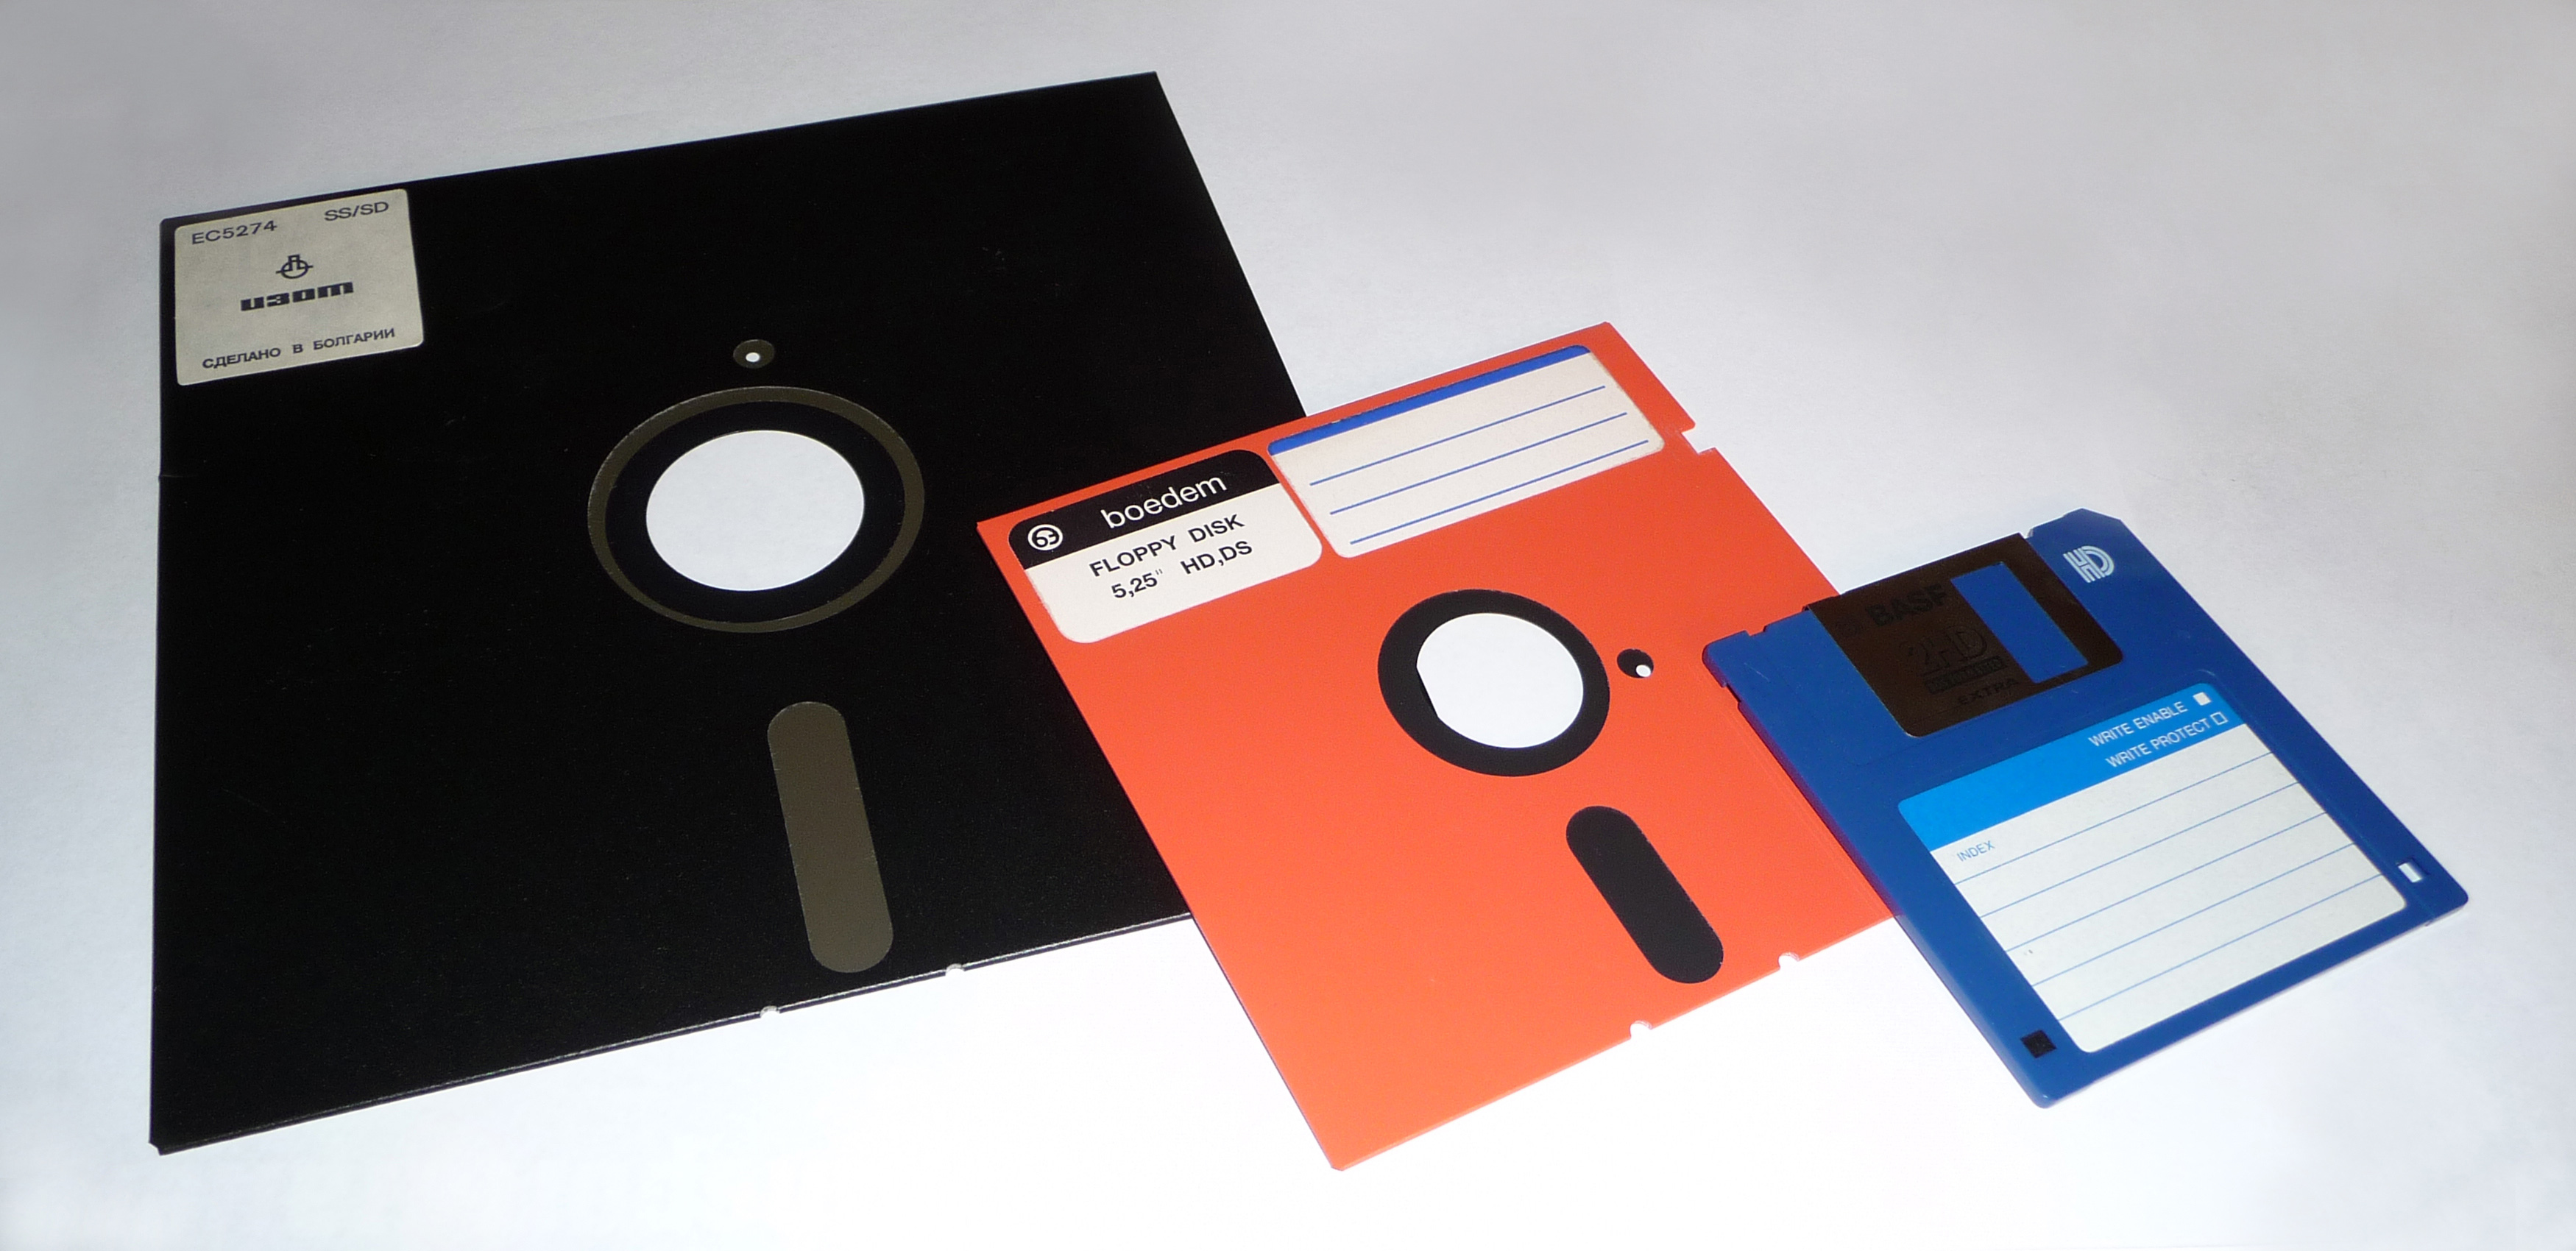 software museum vol 2 floppy da 5 1 4. Black Bedroom Furniture Sets. Home Design Ideas